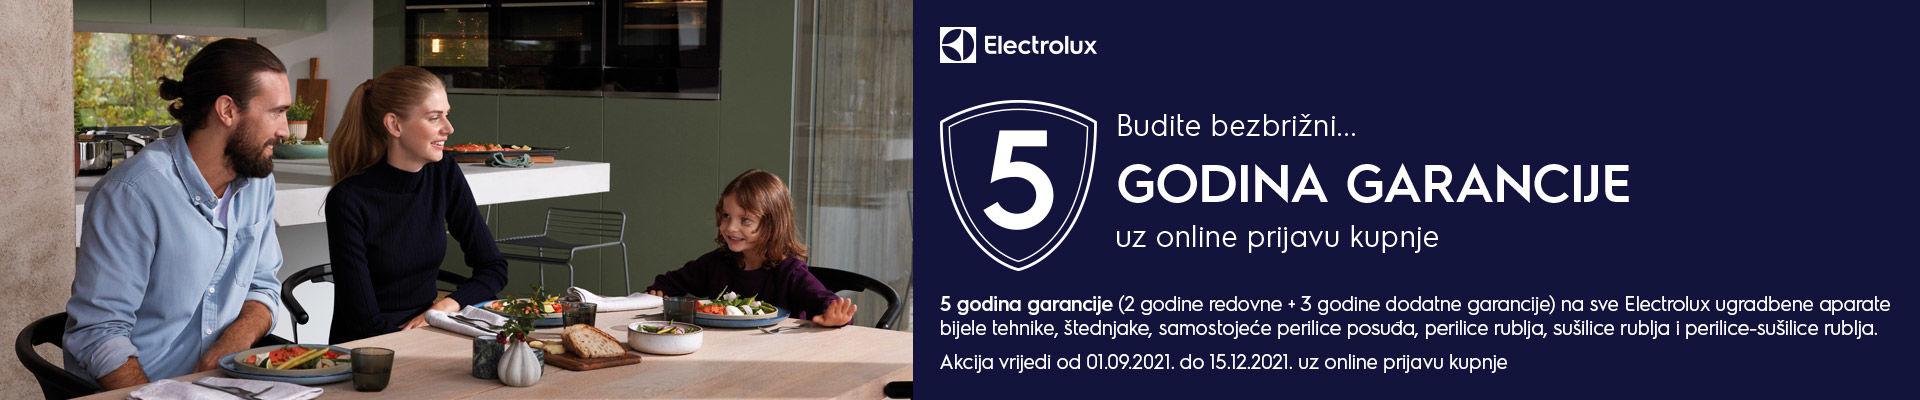 alles-electolux-jamstvo-garancija-perilica-susilica-pecnica-stednjak